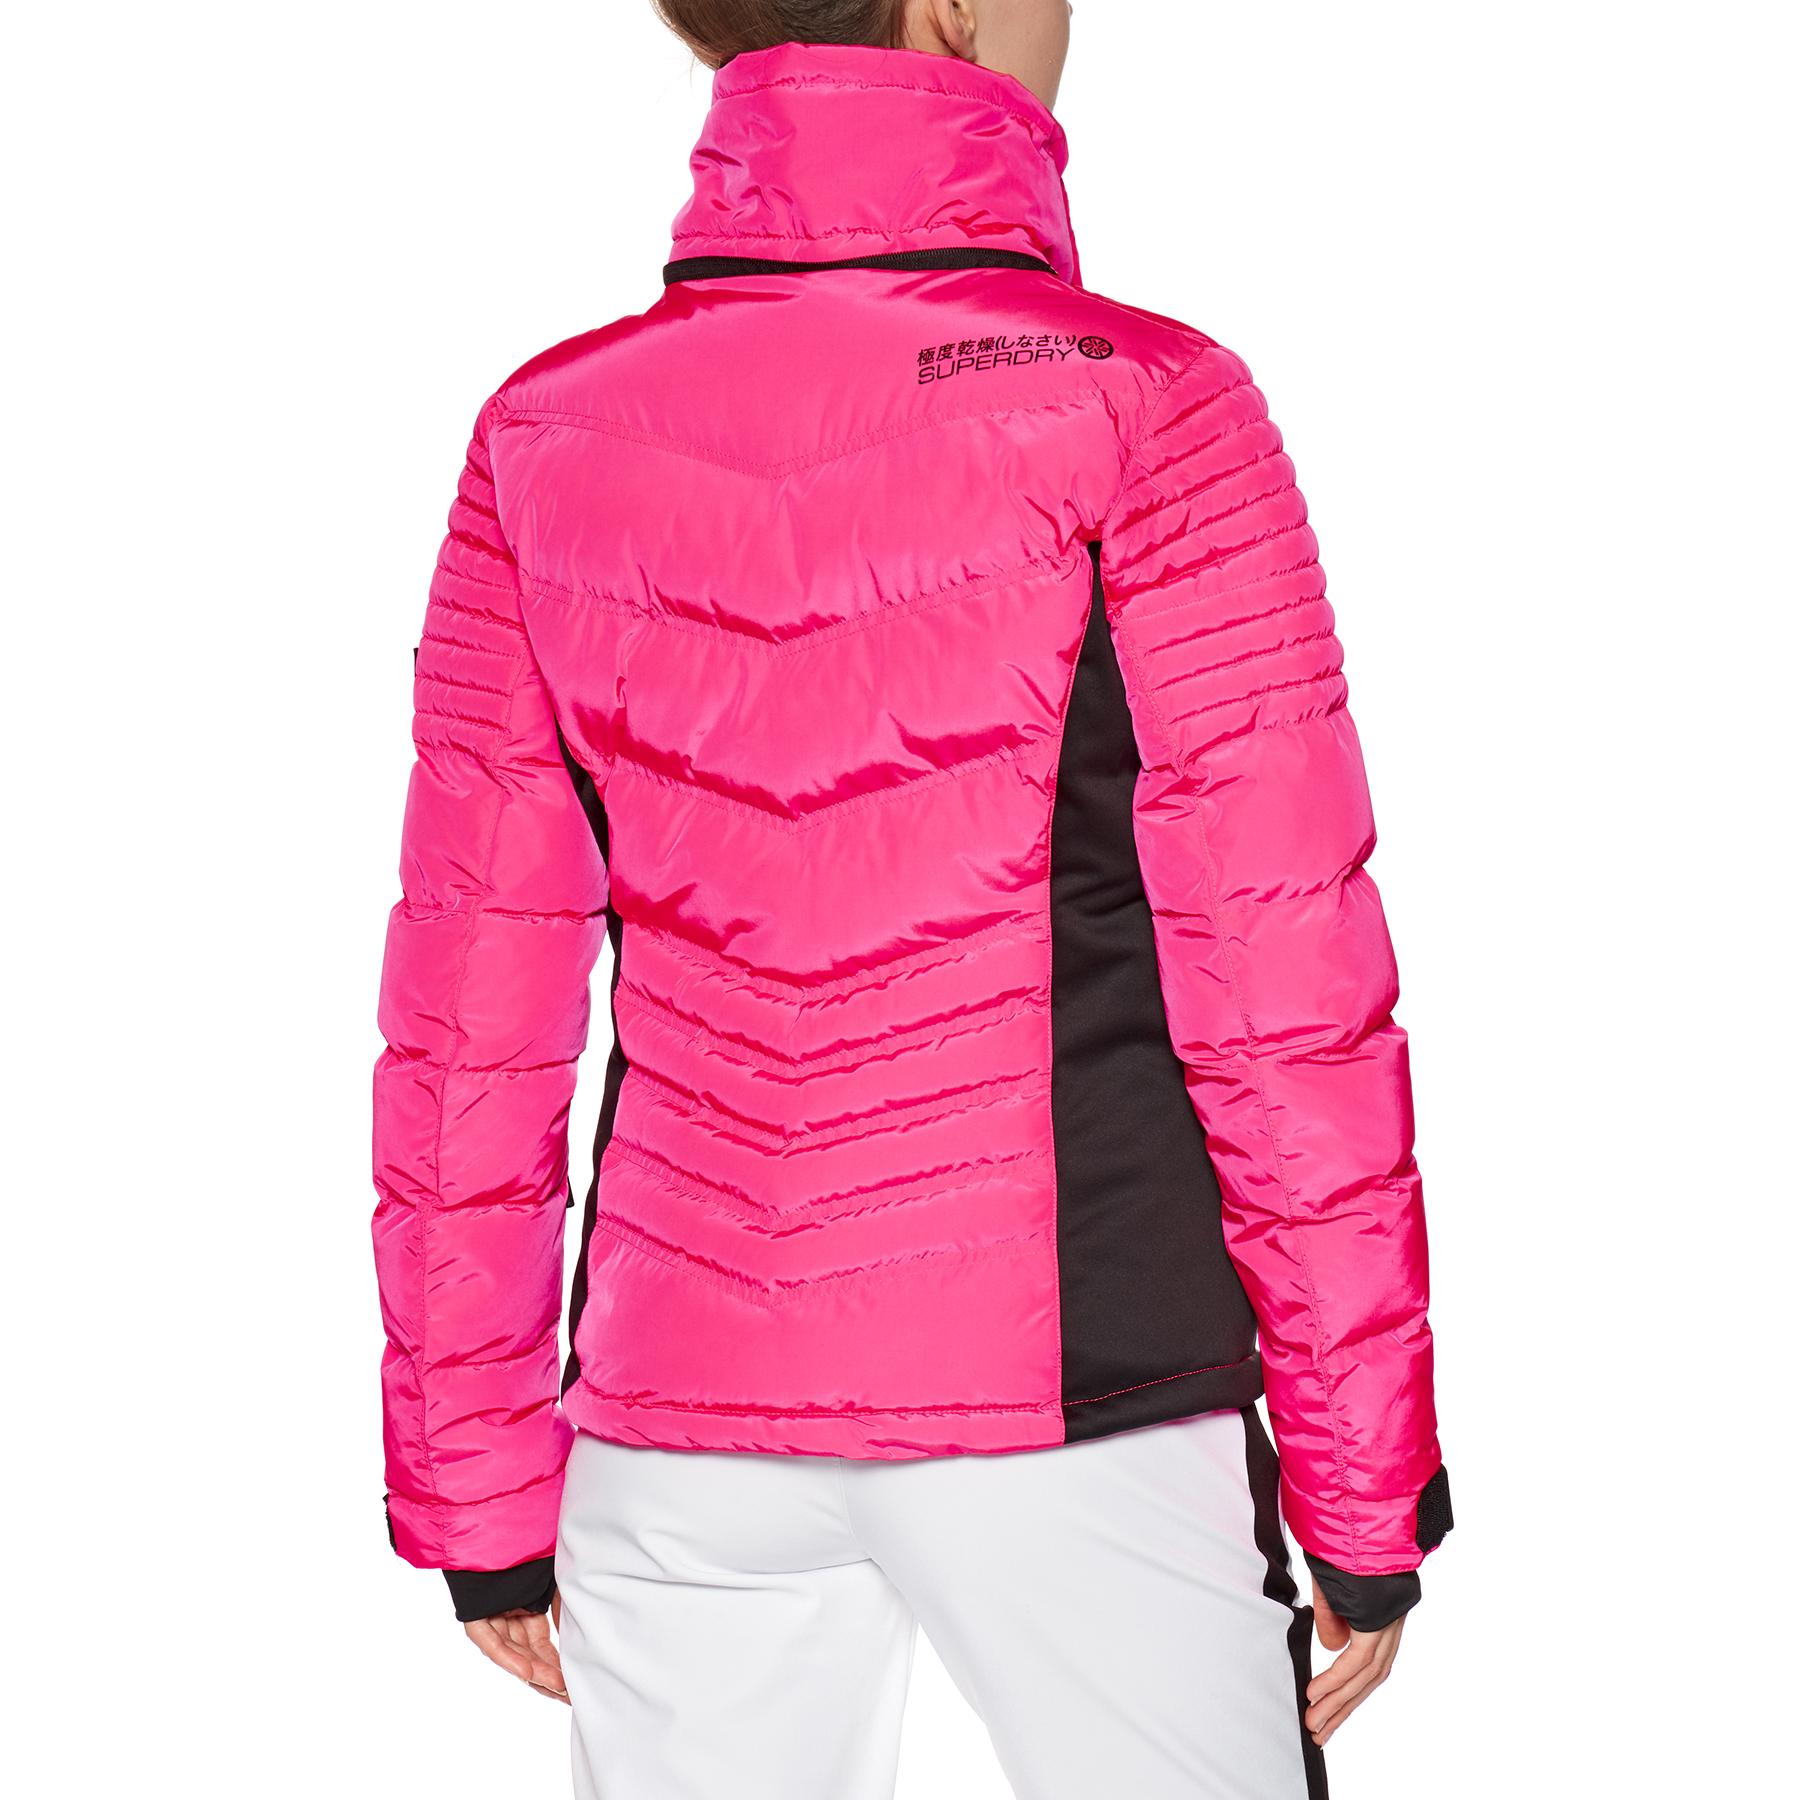 Blouson pour Snowboard Femme Superdry Luxe Snow Puffer